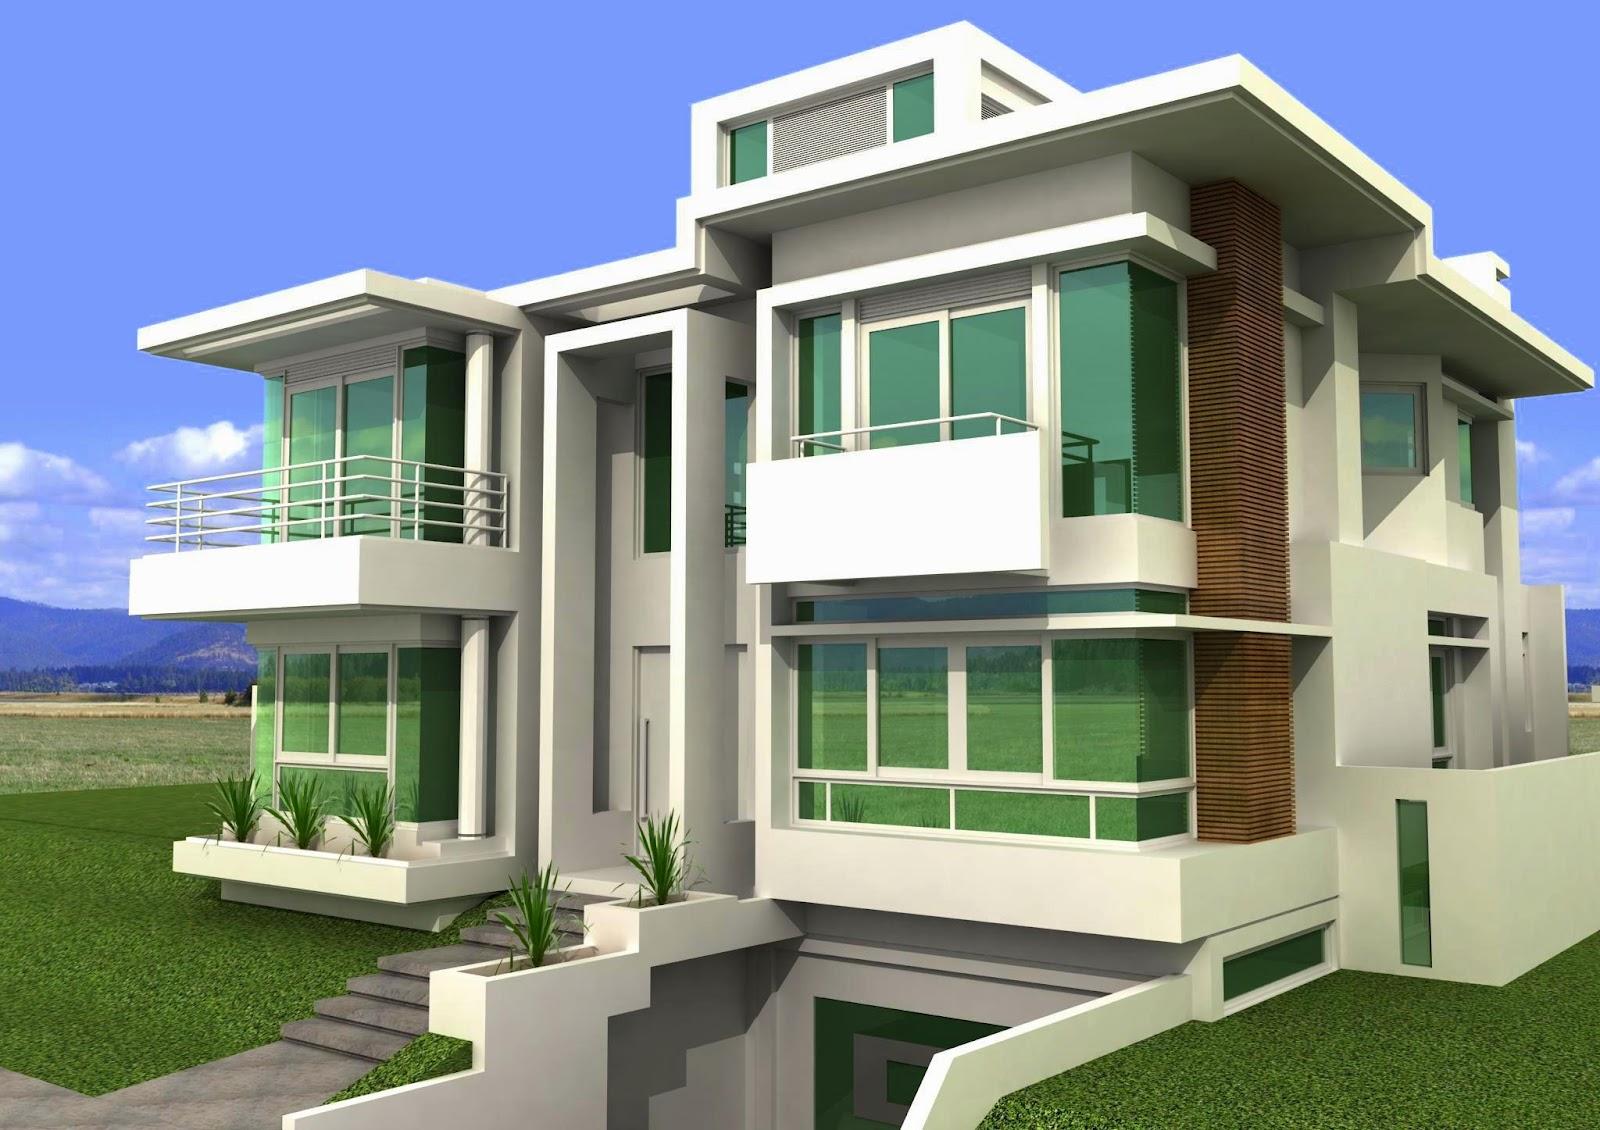 resid ncia lc celso thom arquitetura. Black Bedroom Furniture Sets. Home Design Ideas